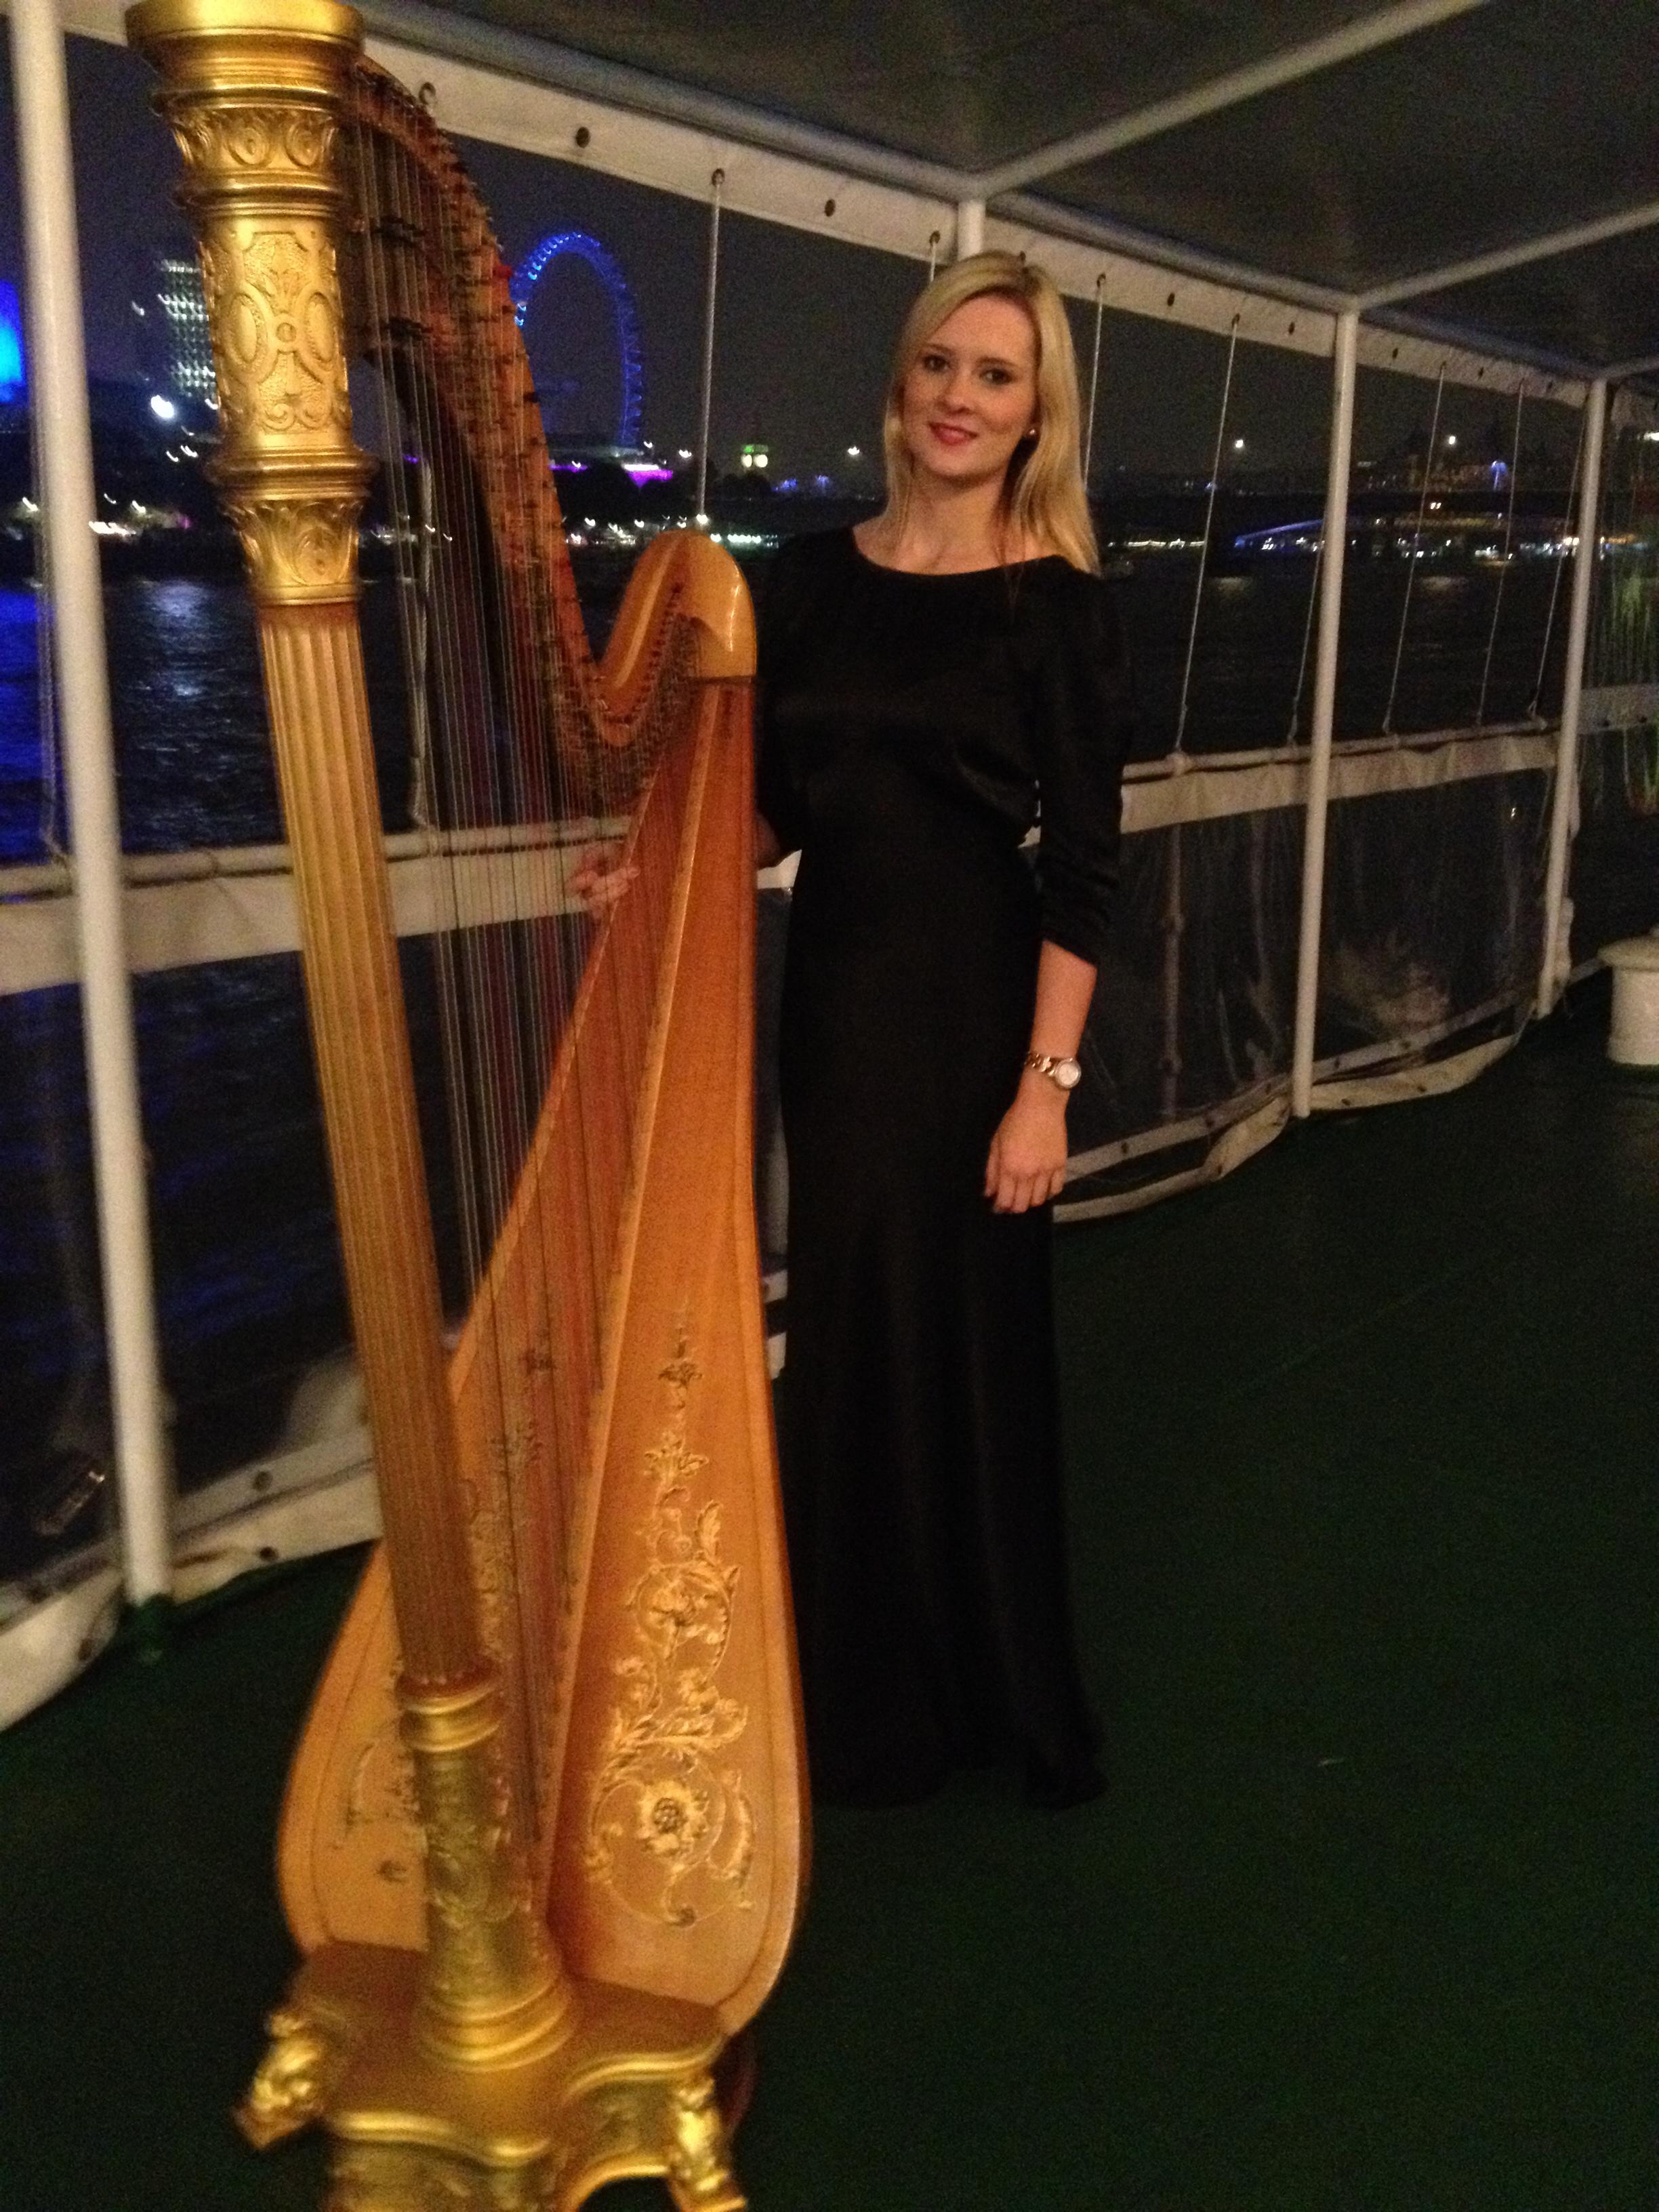 Event on Thames riverboat